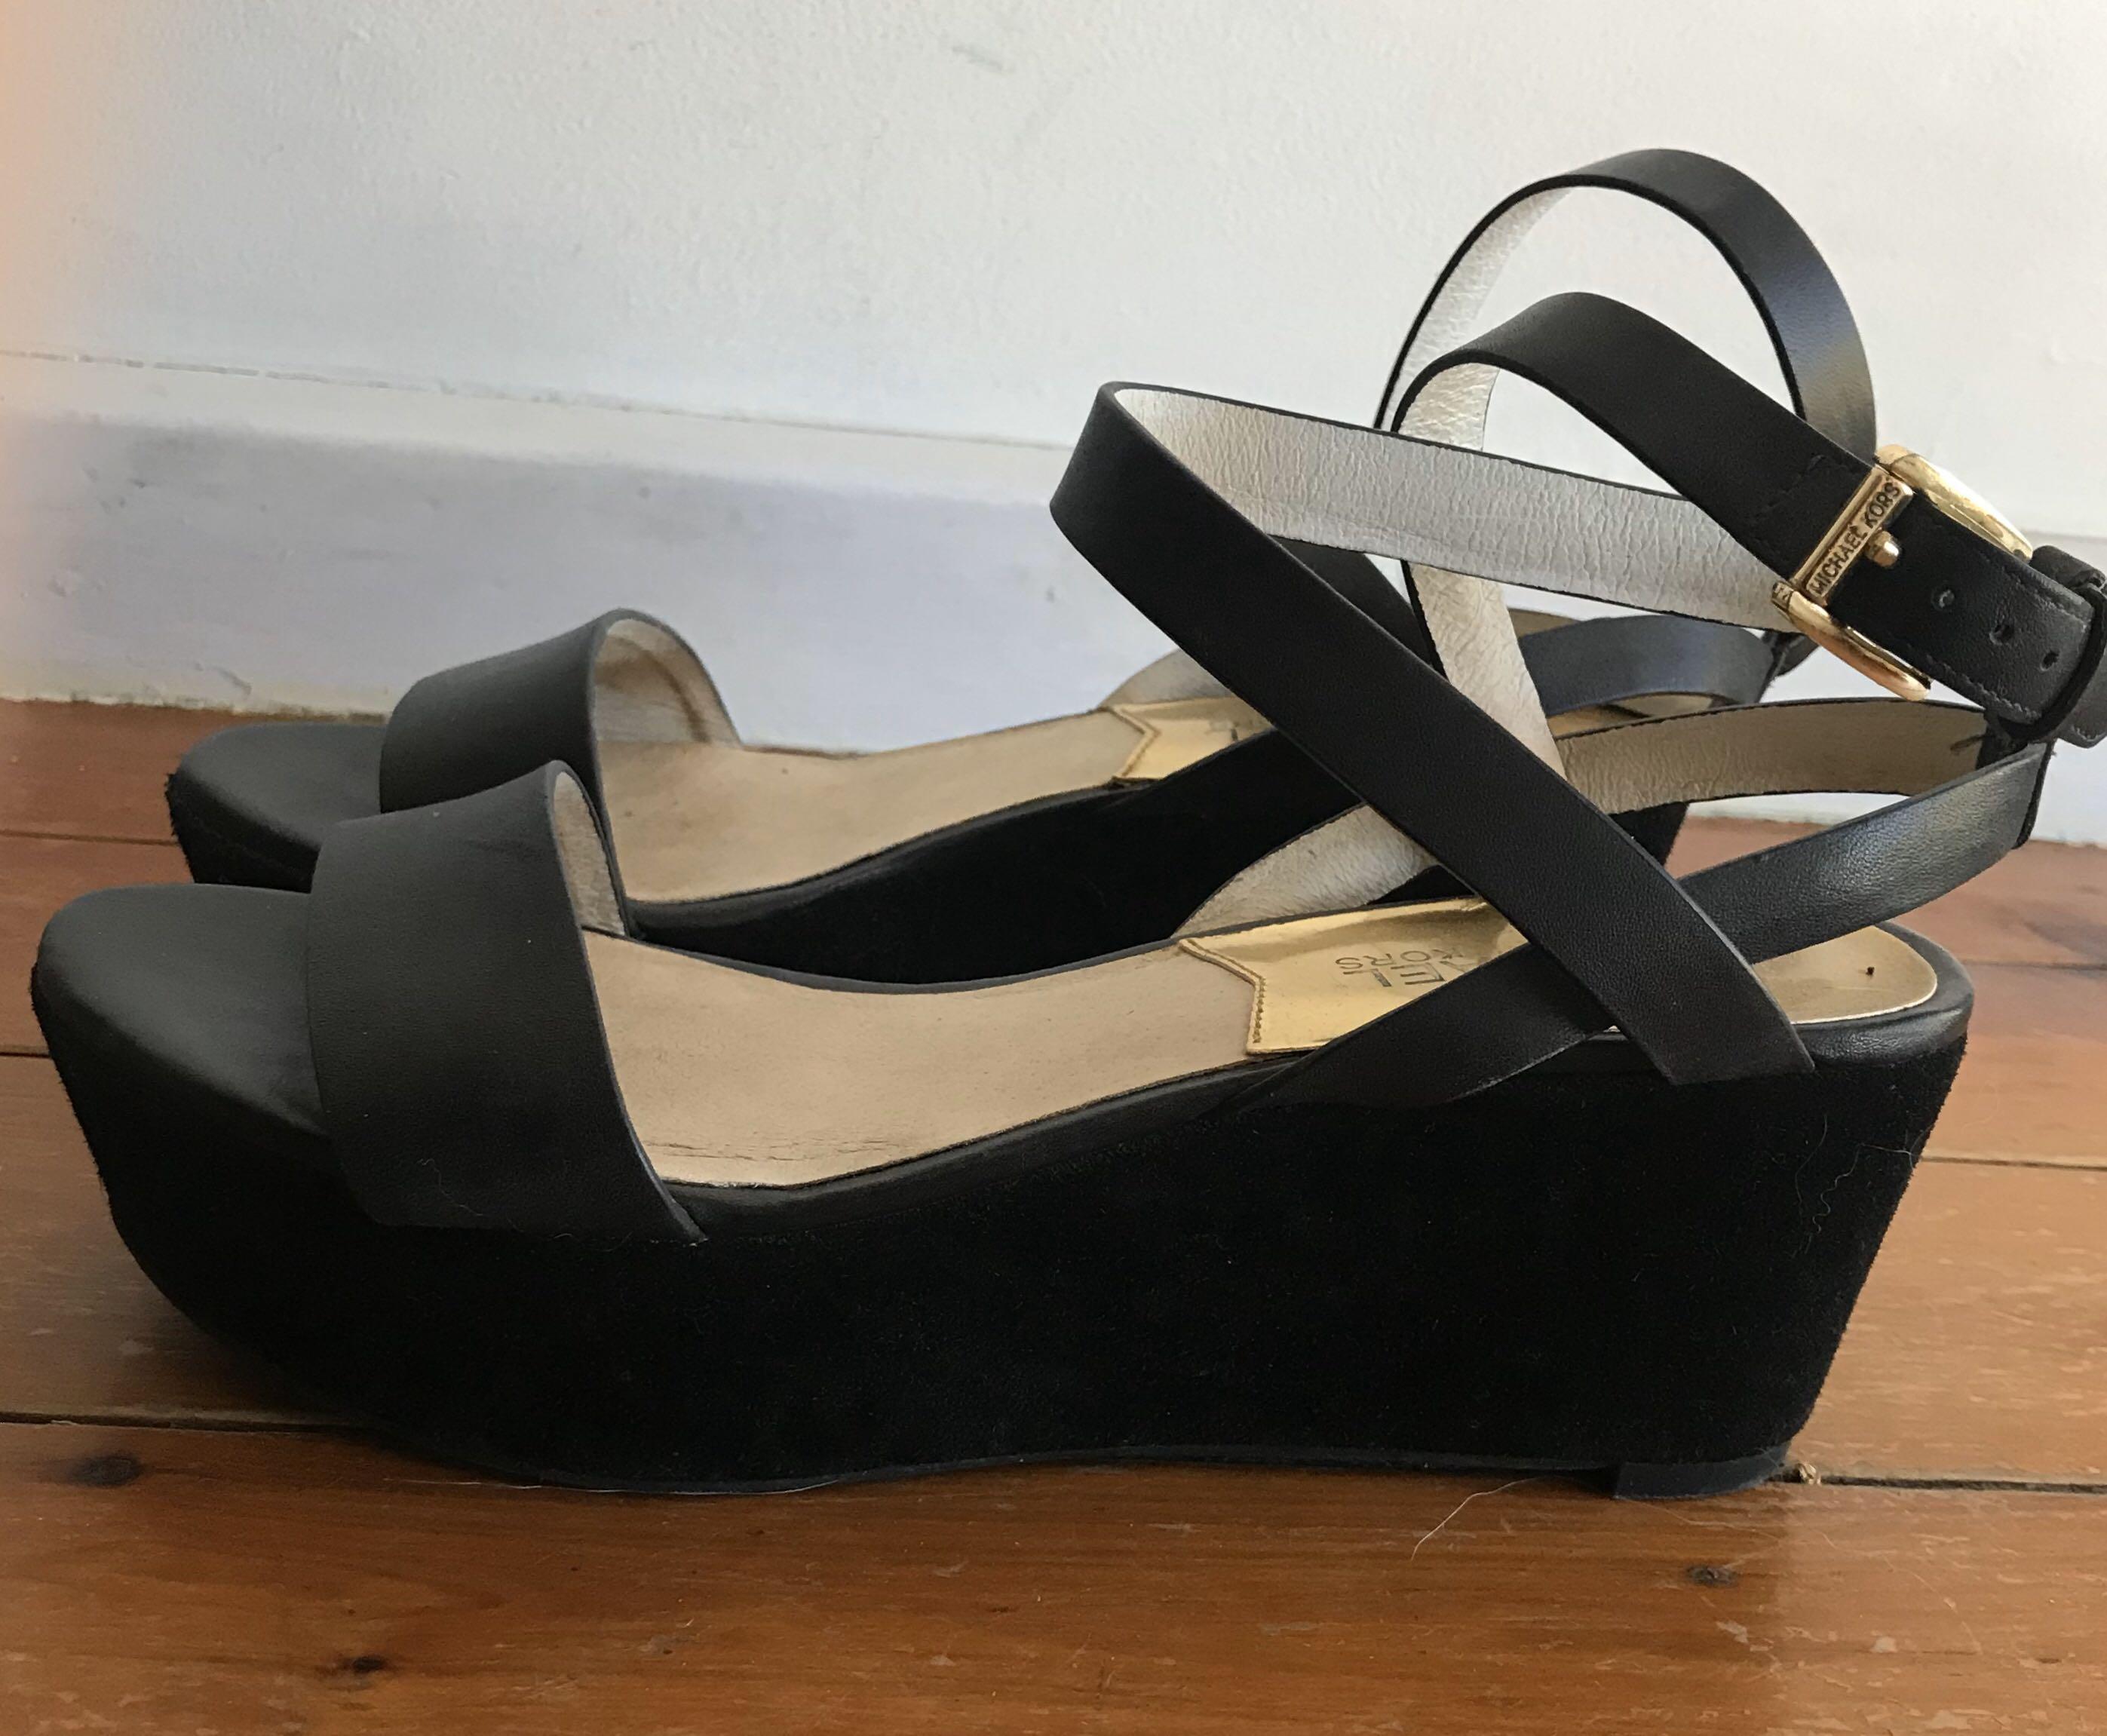 Michael Kors Wedges / Sandals